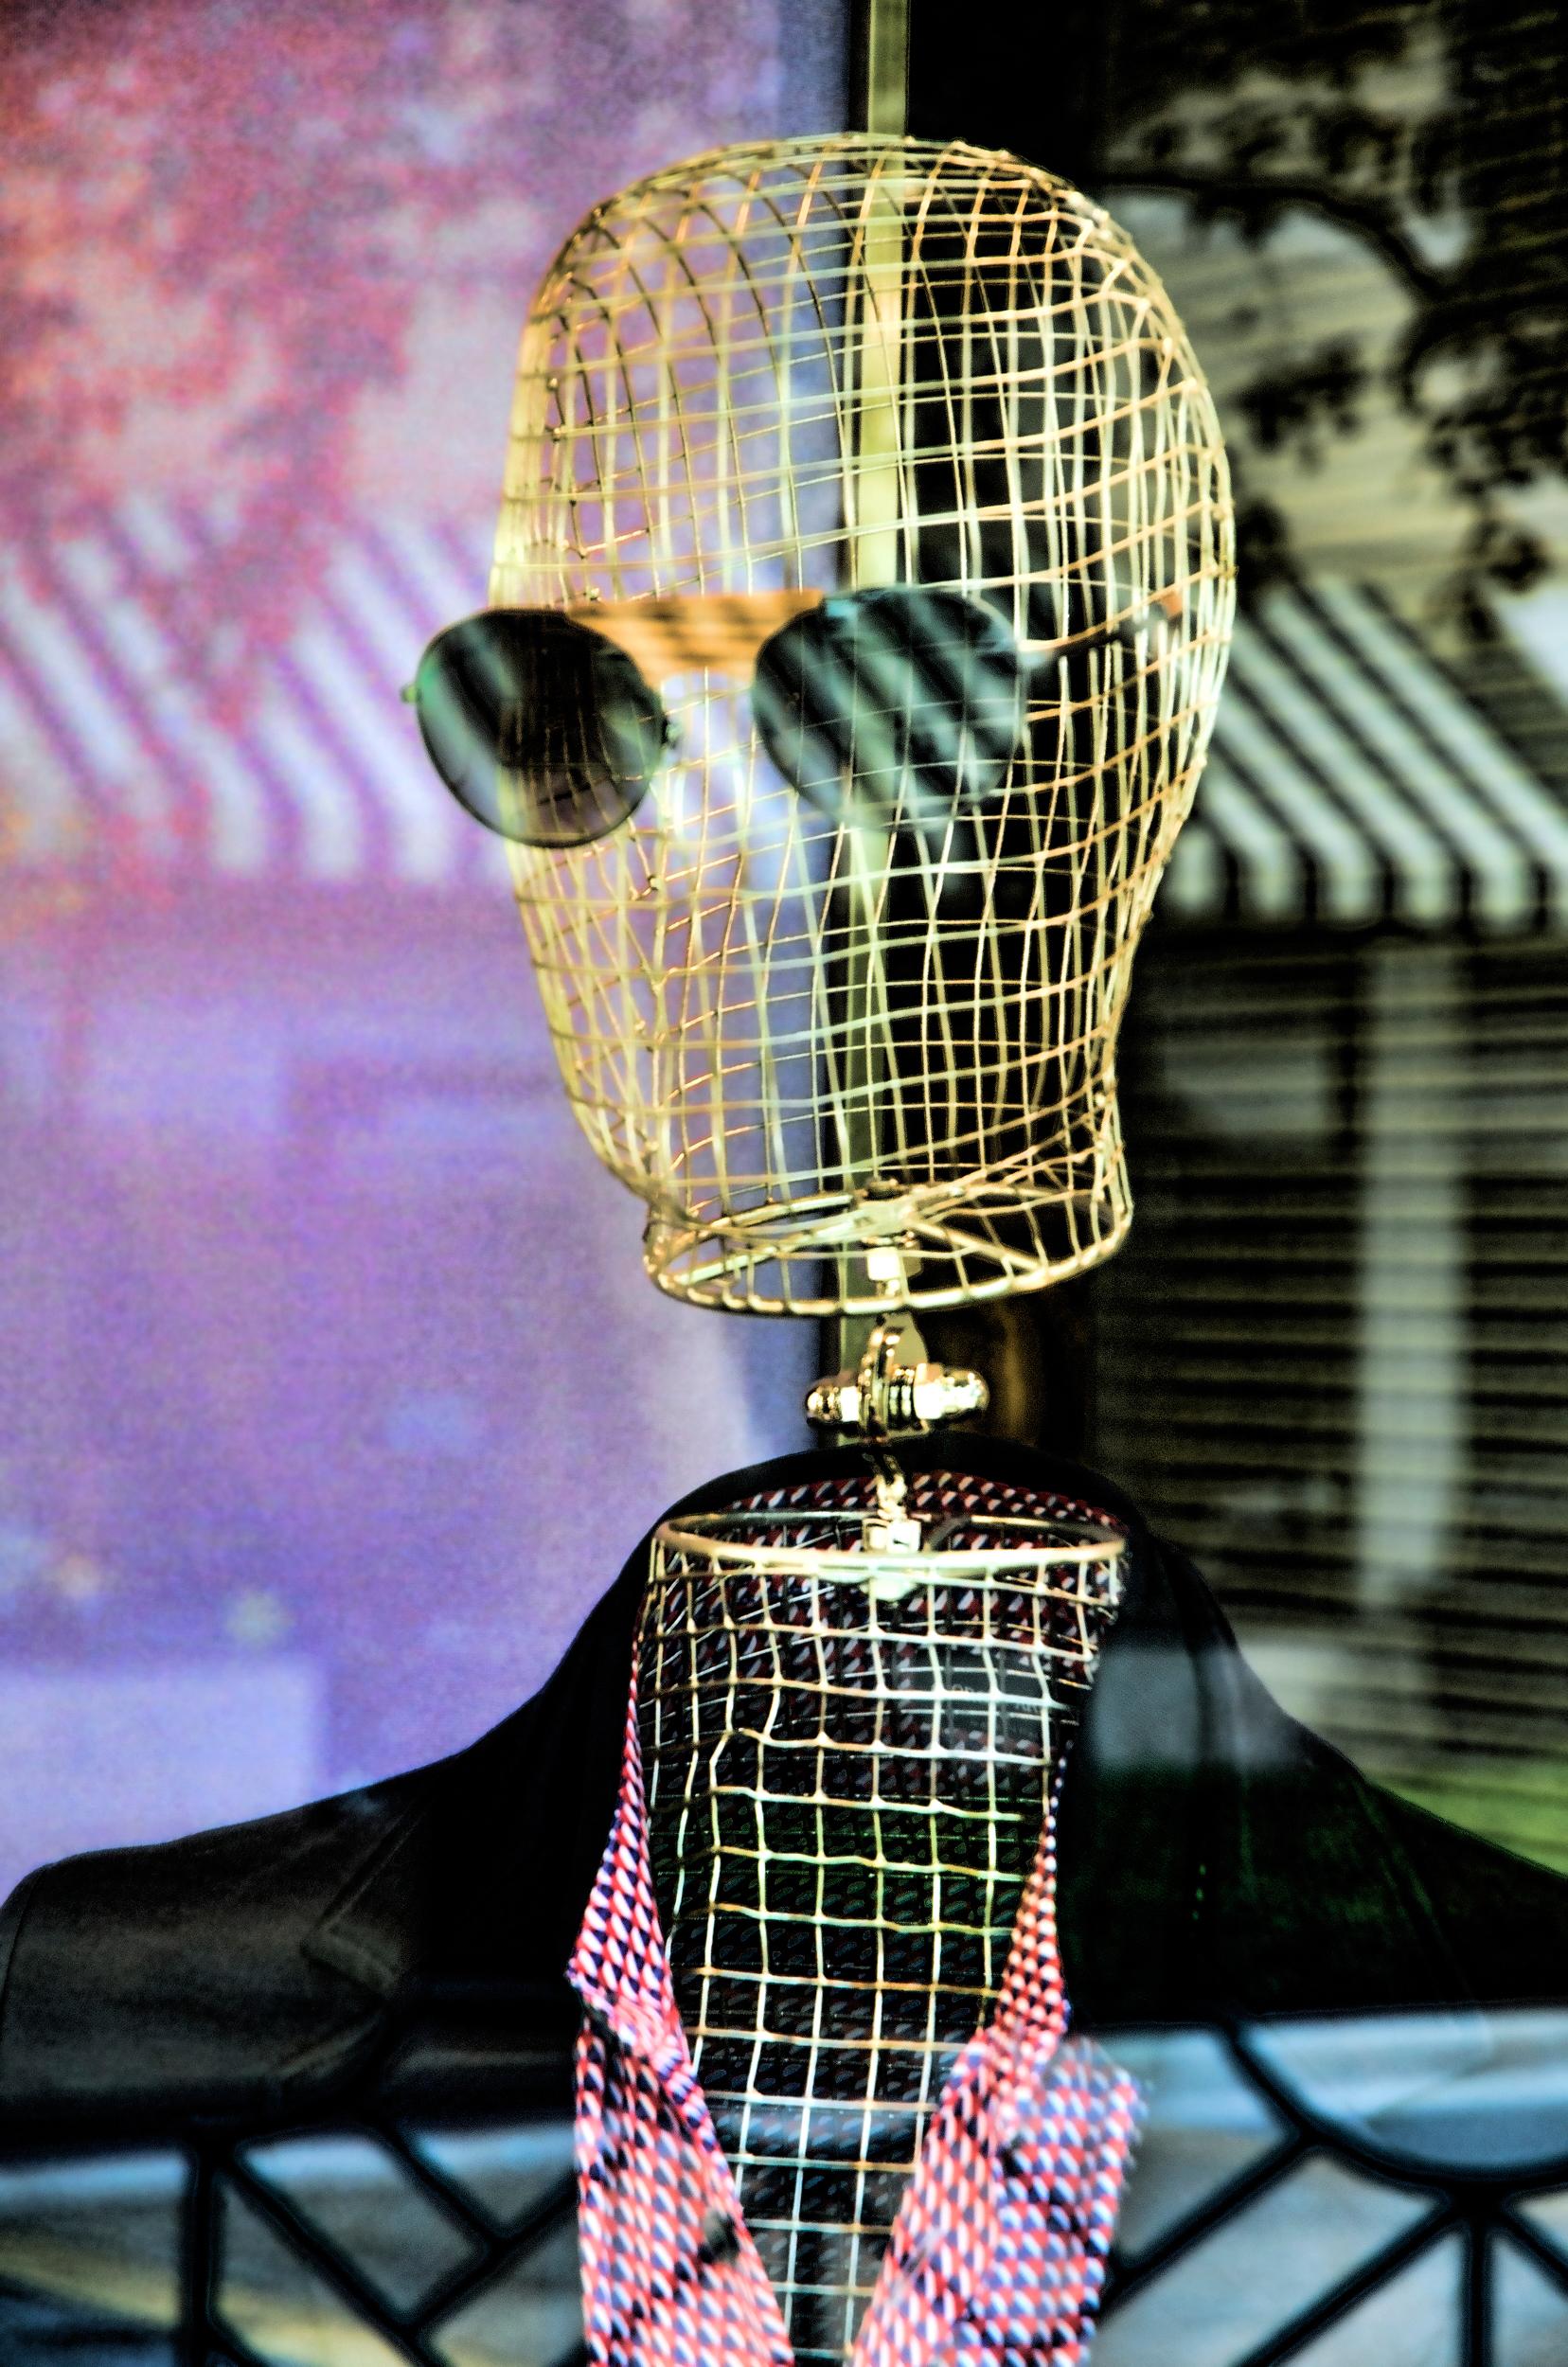 Storefront mannequin